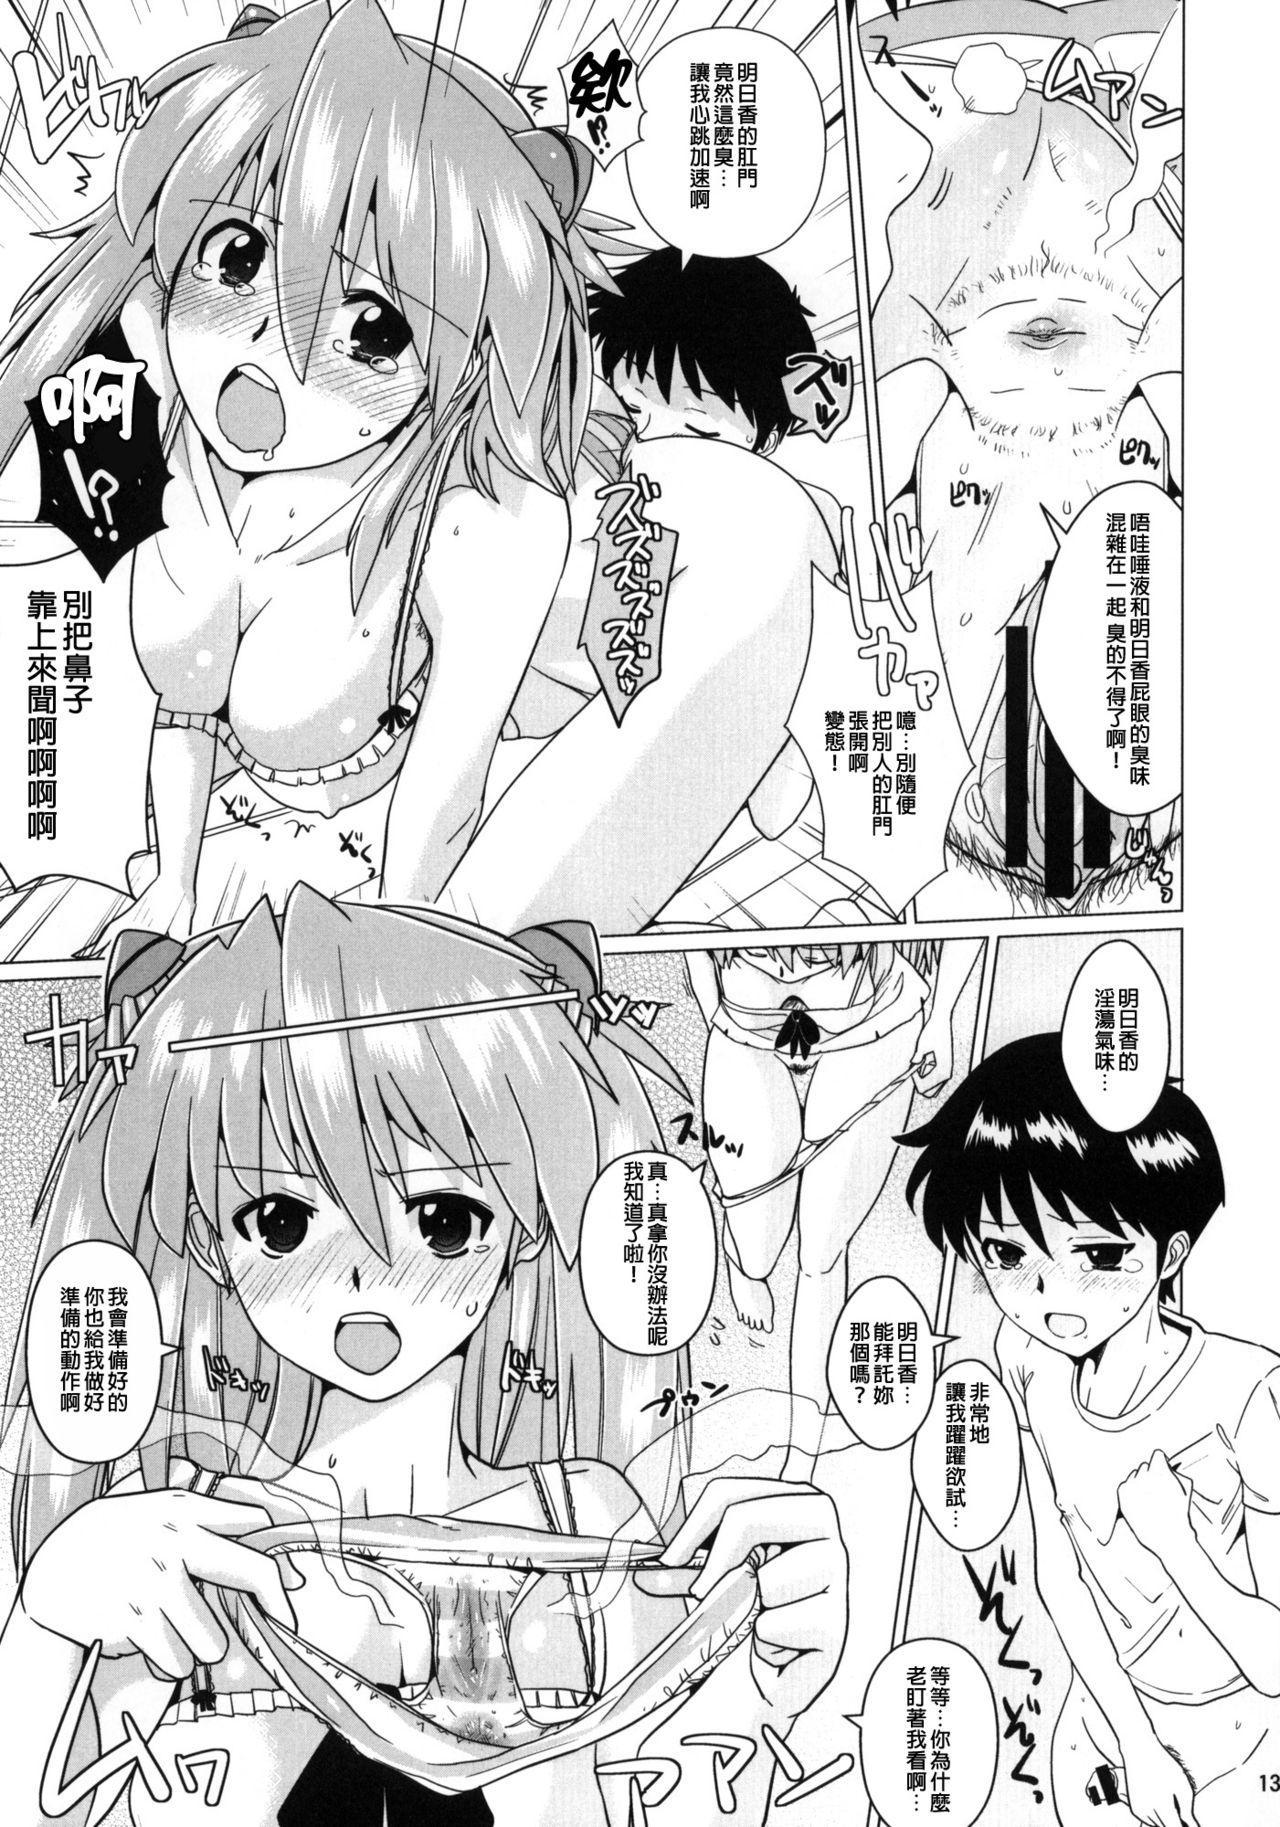 Sodom no Hyakunijyuu Jikan + Paper 11